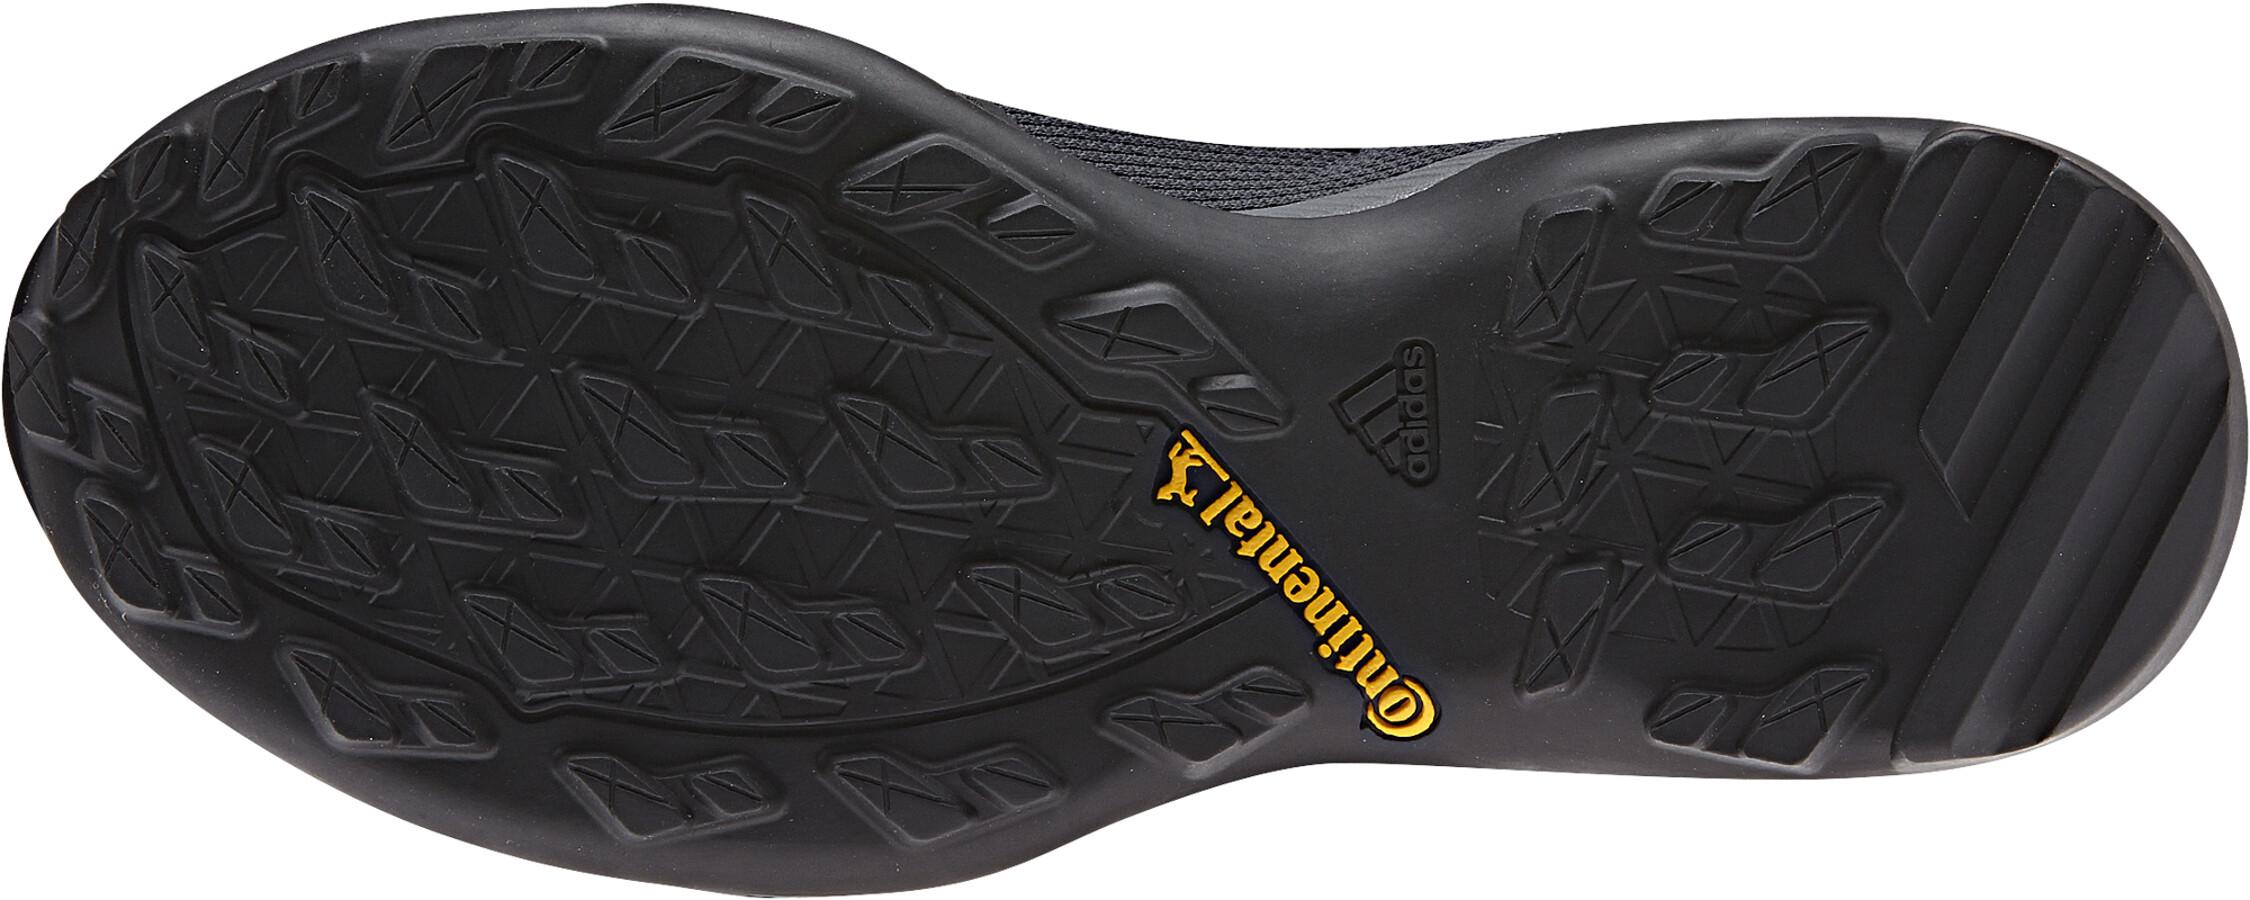 brand new 844a9 2dafe adidas TERREX AX3 Naiset kengät , musta